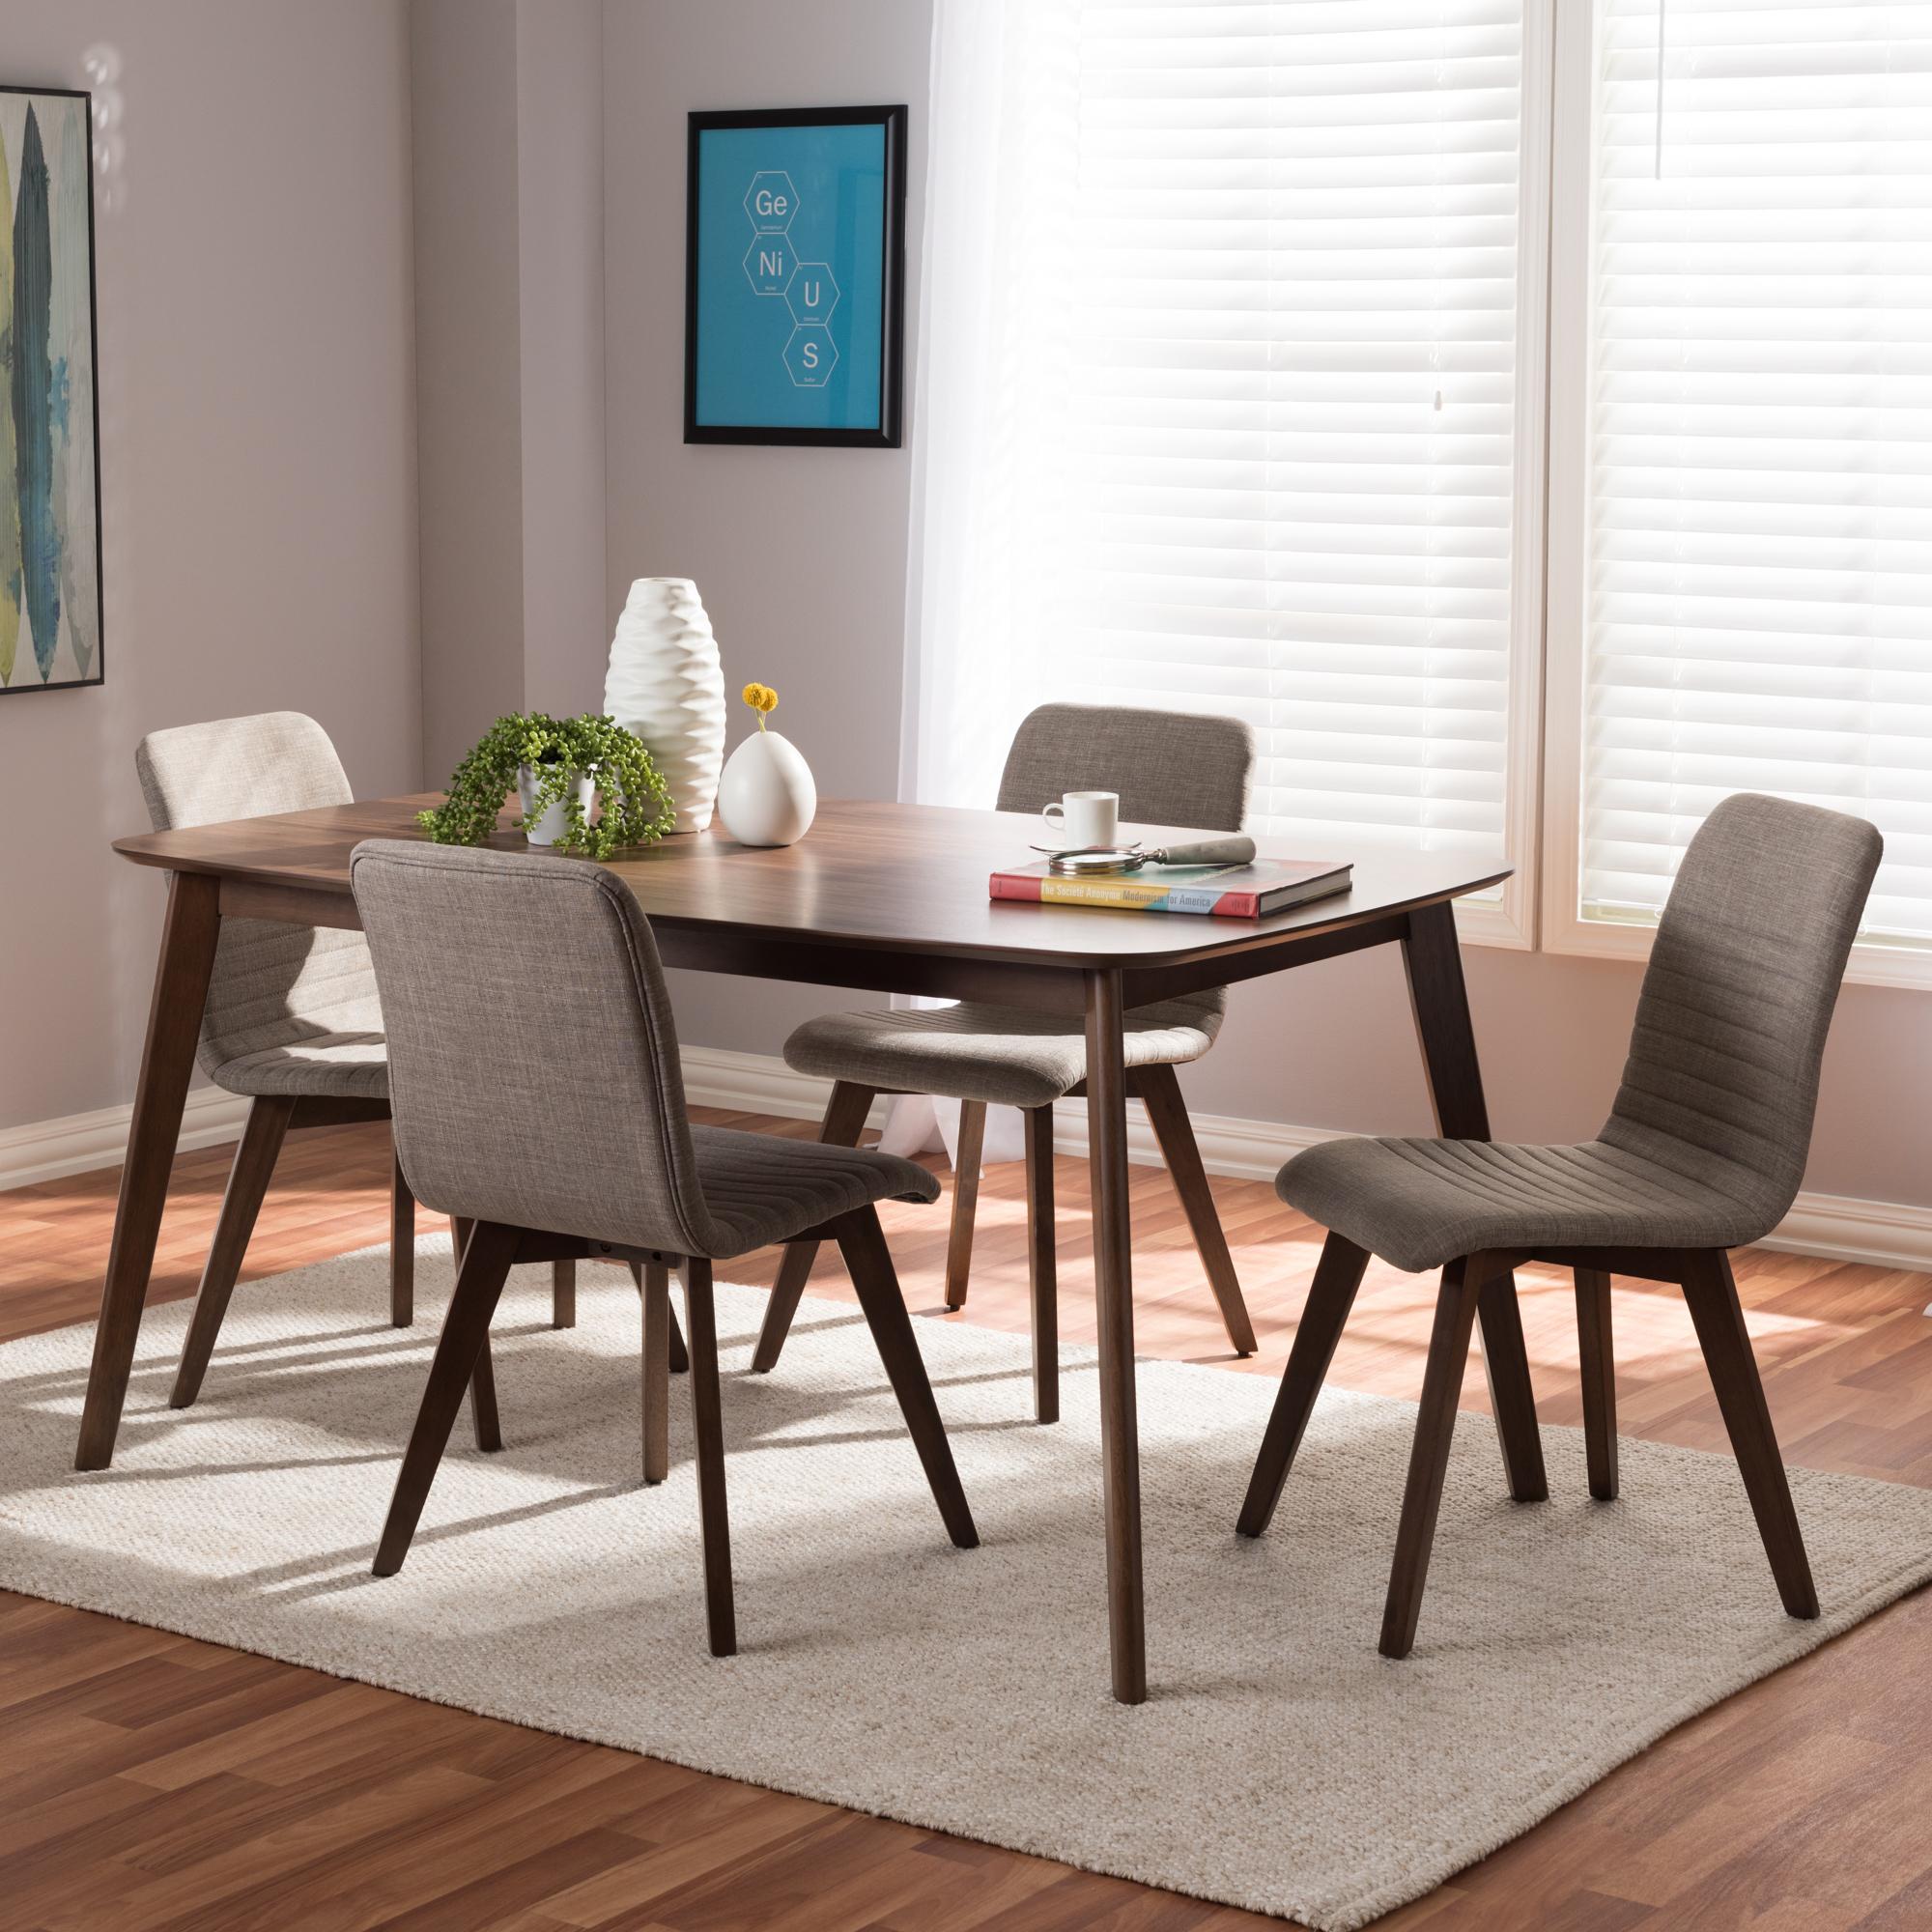 Baxton Studio Sugar Mid Century Modern Light Grey Fabric Upholstered Walnut  Wood Finished 5 Piece Dining Set